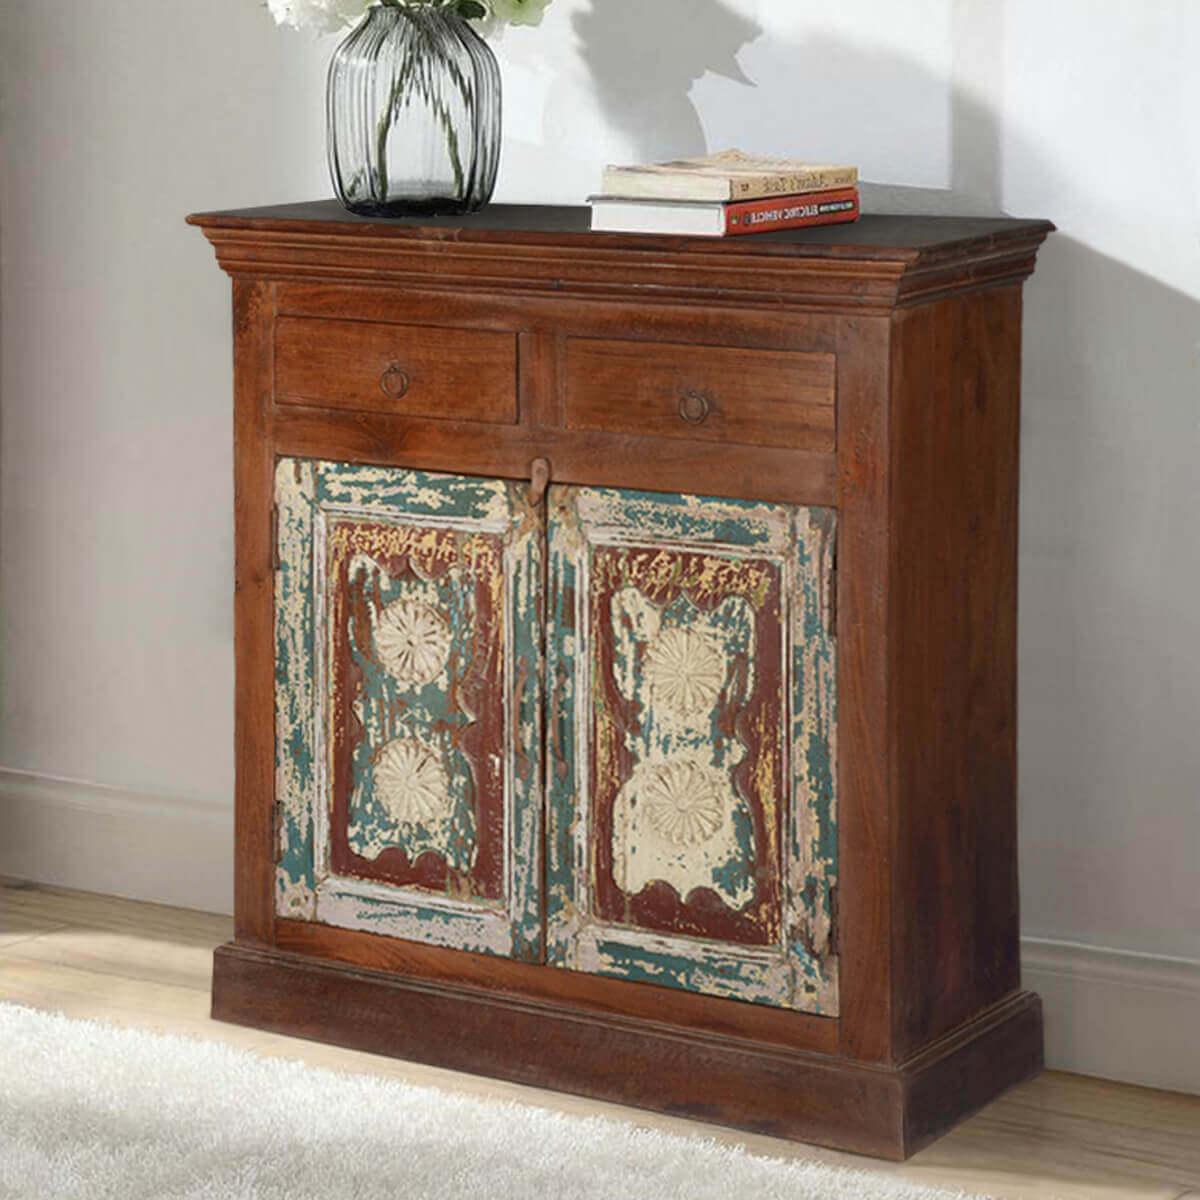 Ebro Rustic Reclaimed Wood Handmade 2 Drawer Buffet Cabinet